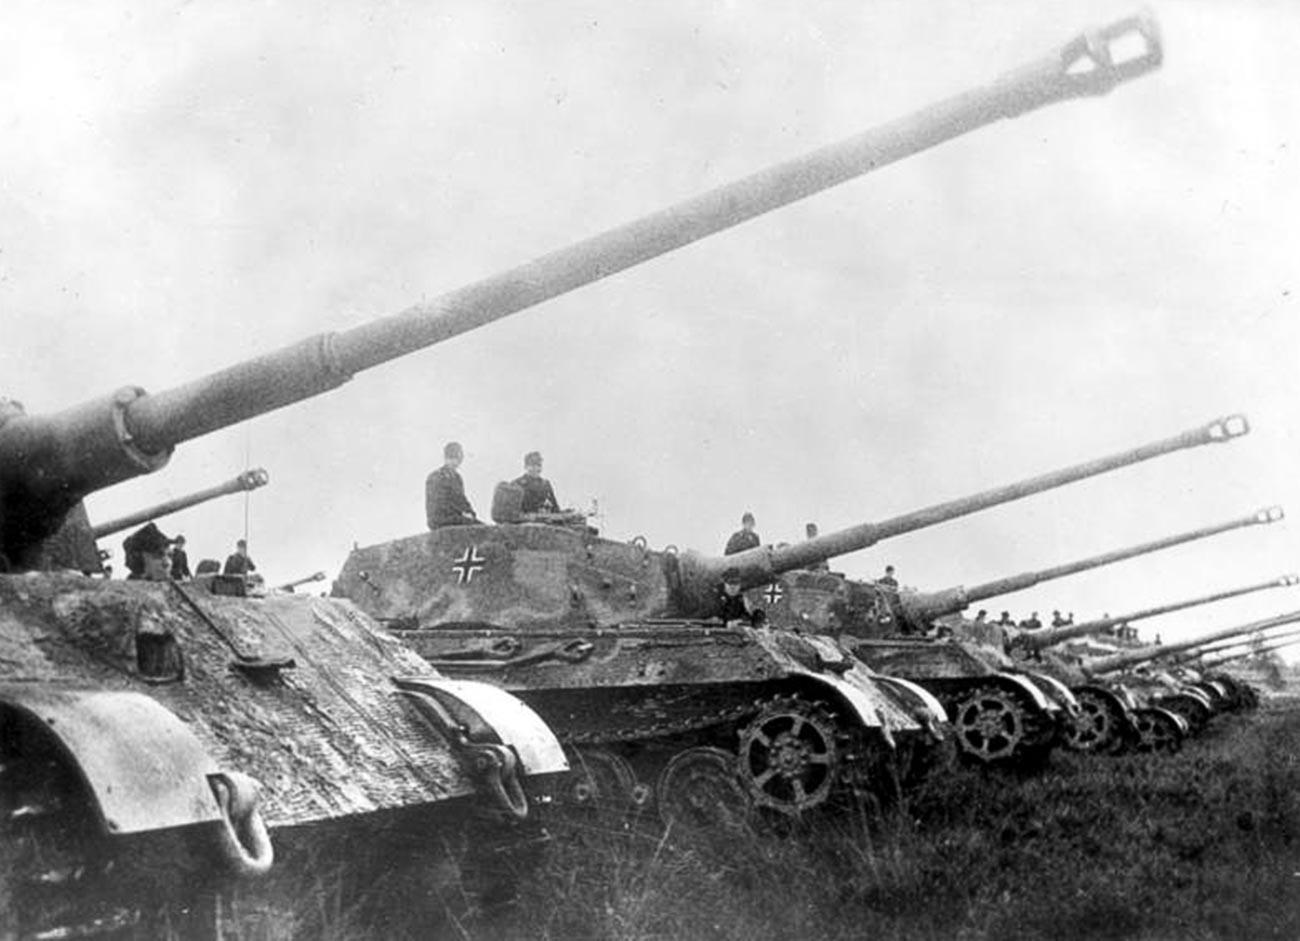 Немачки тешки тенкови Панцер VI Тигар били су масовно коришћени у борбама и напуштани при повлачењу.